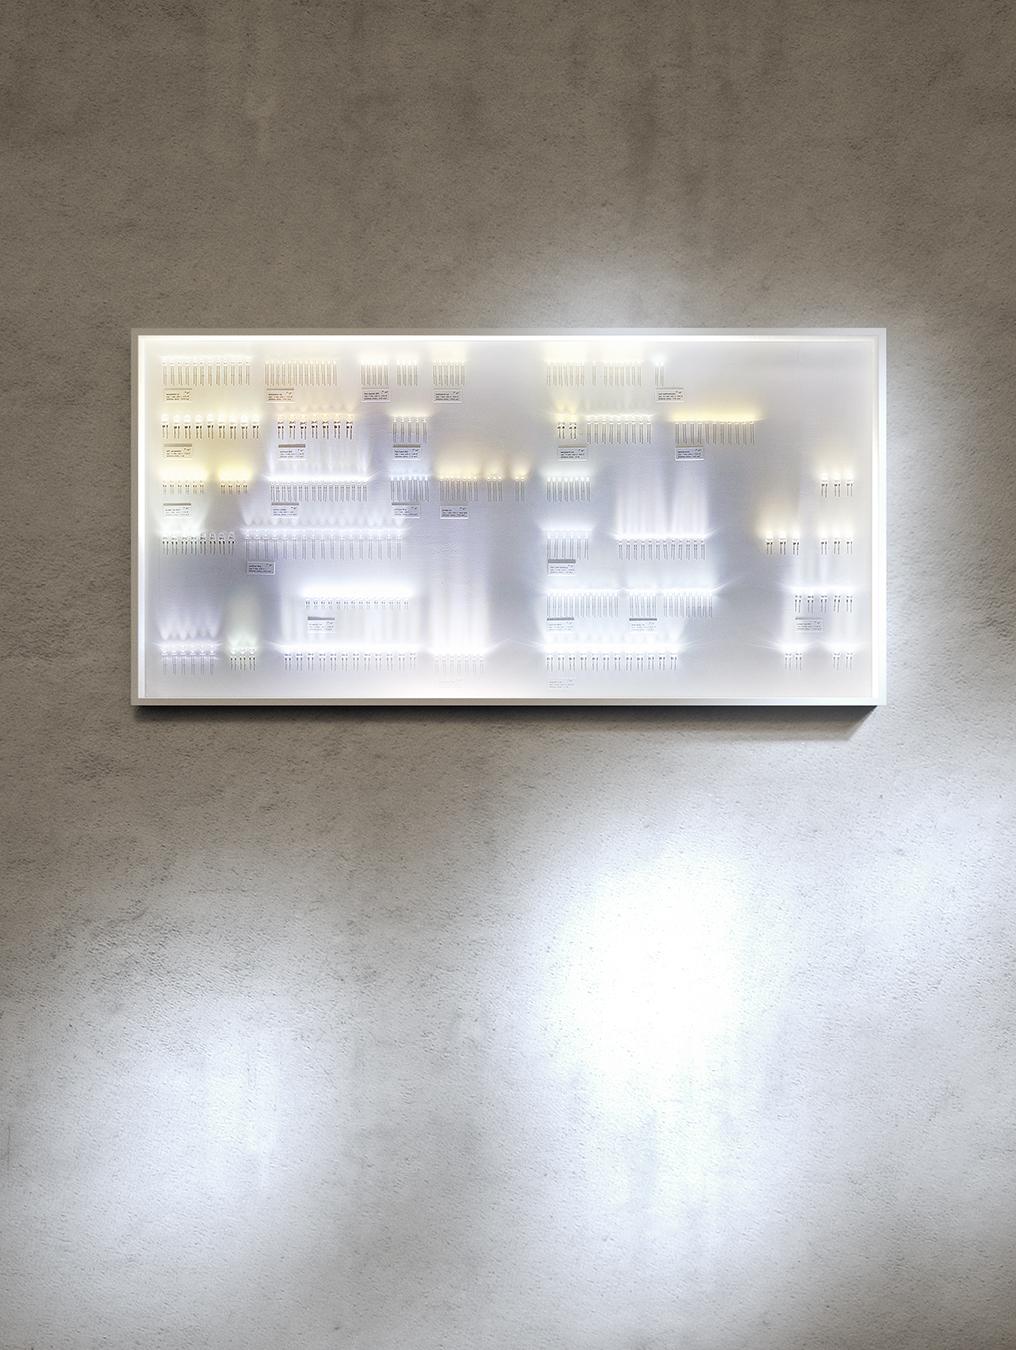 smK034_COLLECTION OF LIGHT 300_2_TIF.jpg